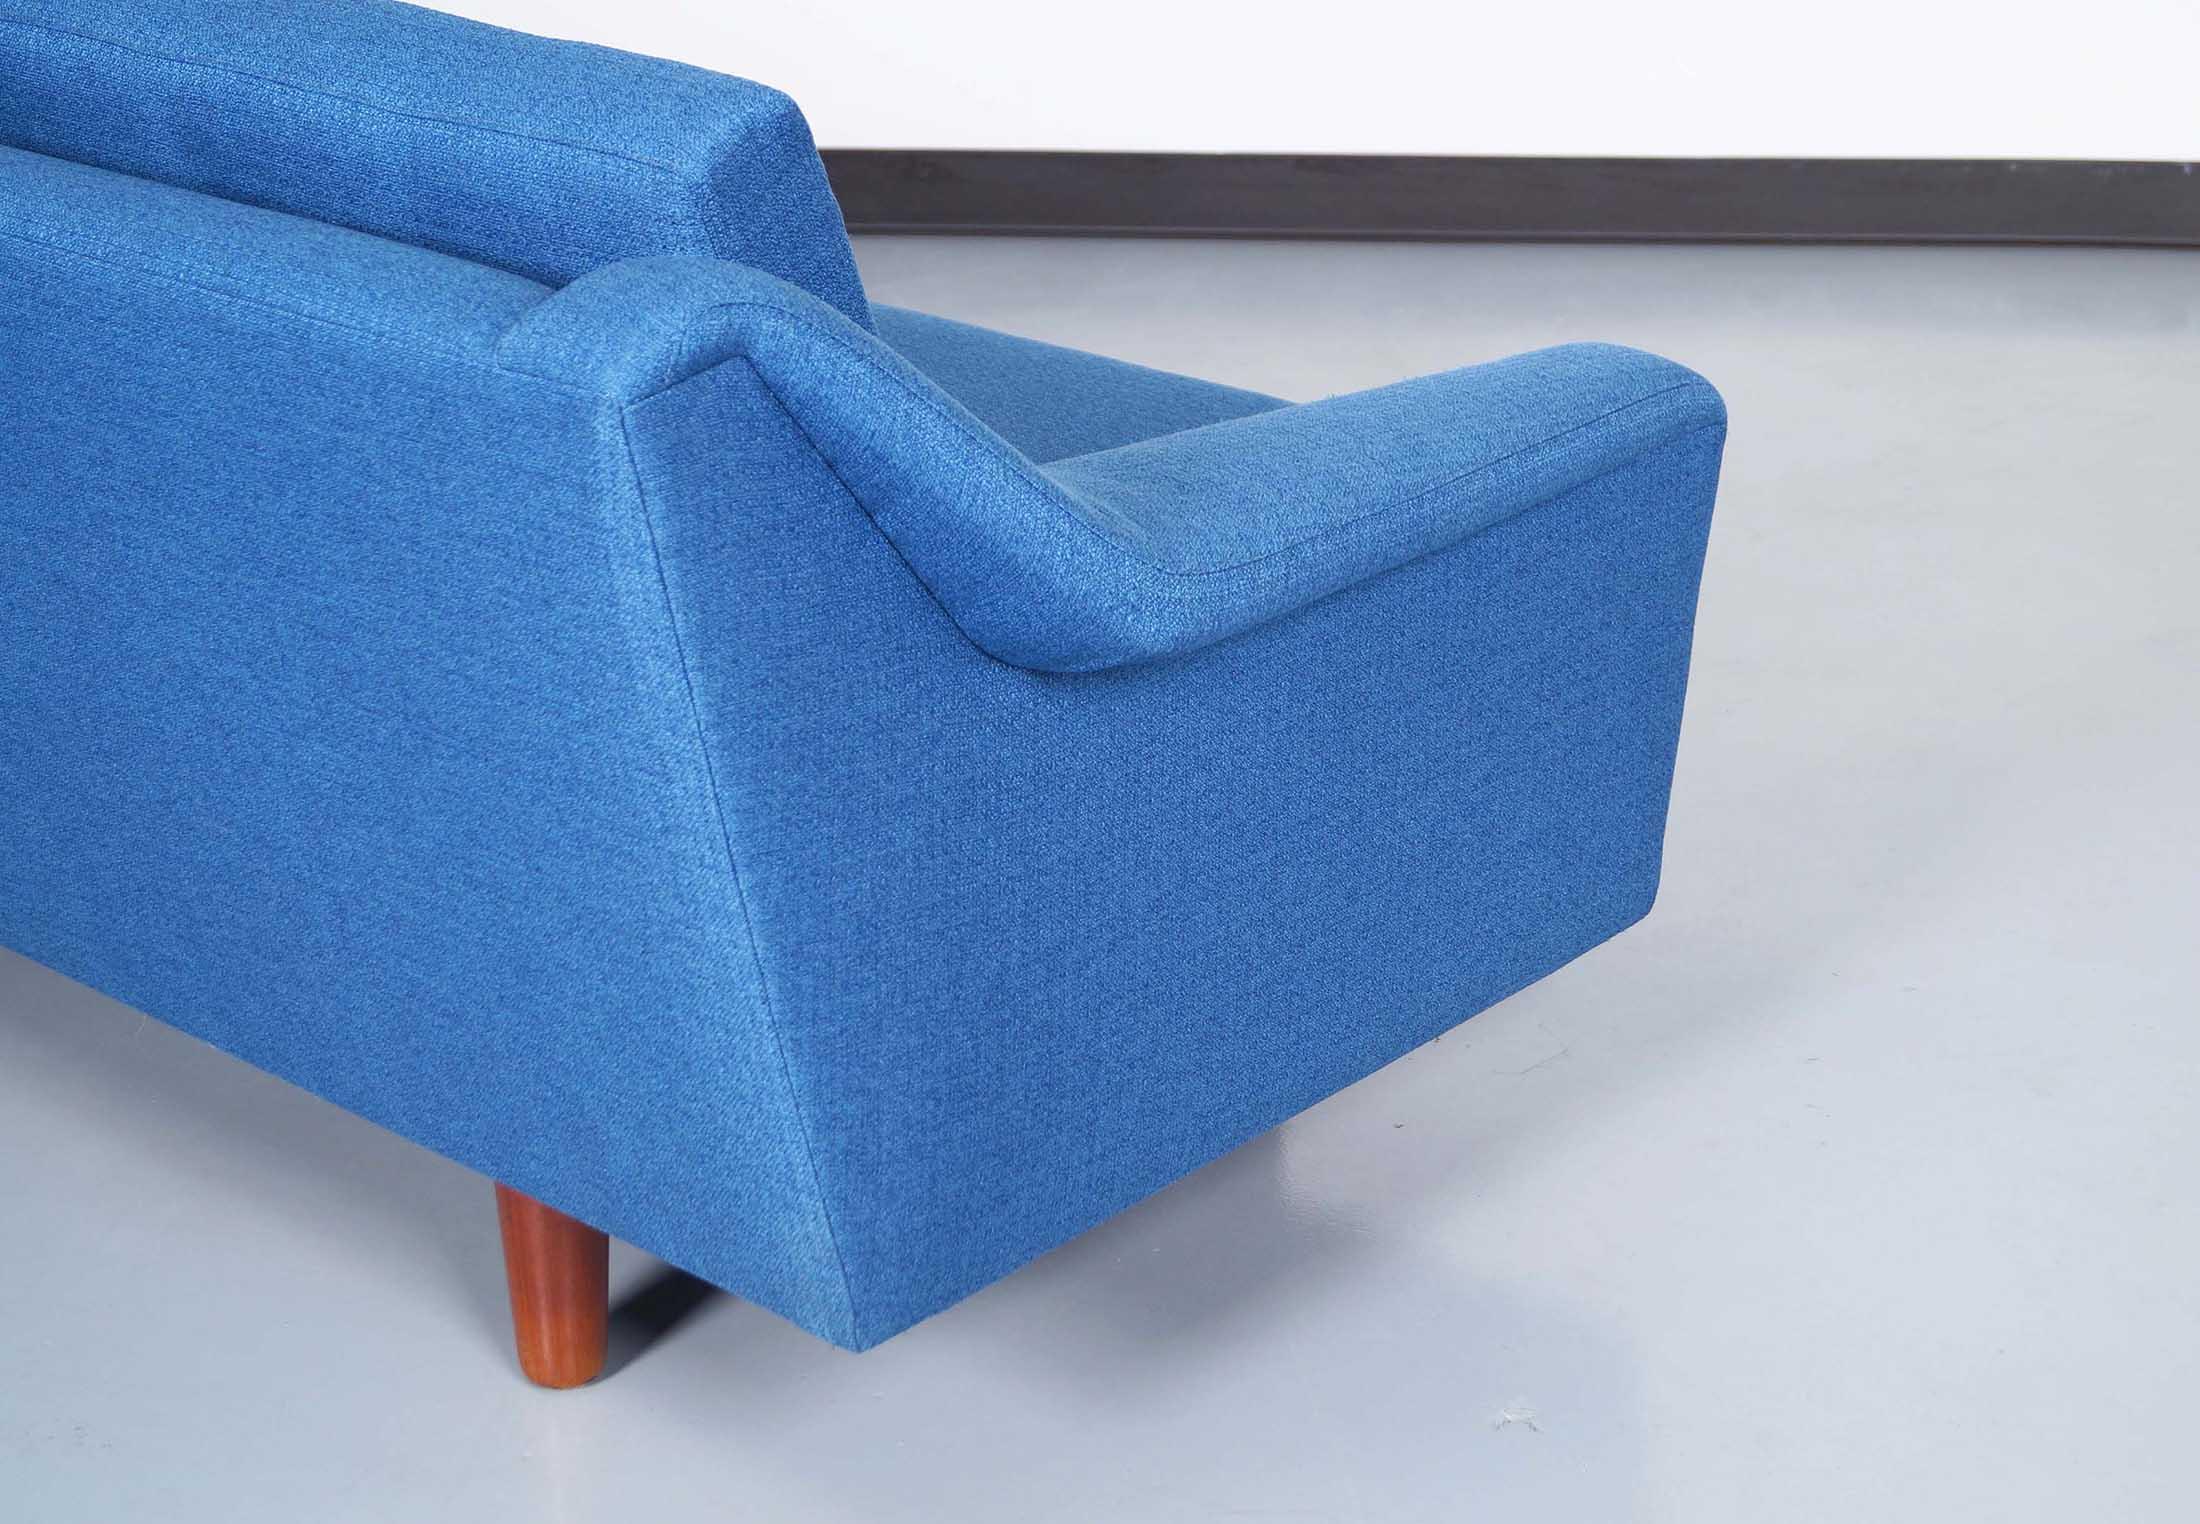 Danish Modern Sofa by Illums Bolighus